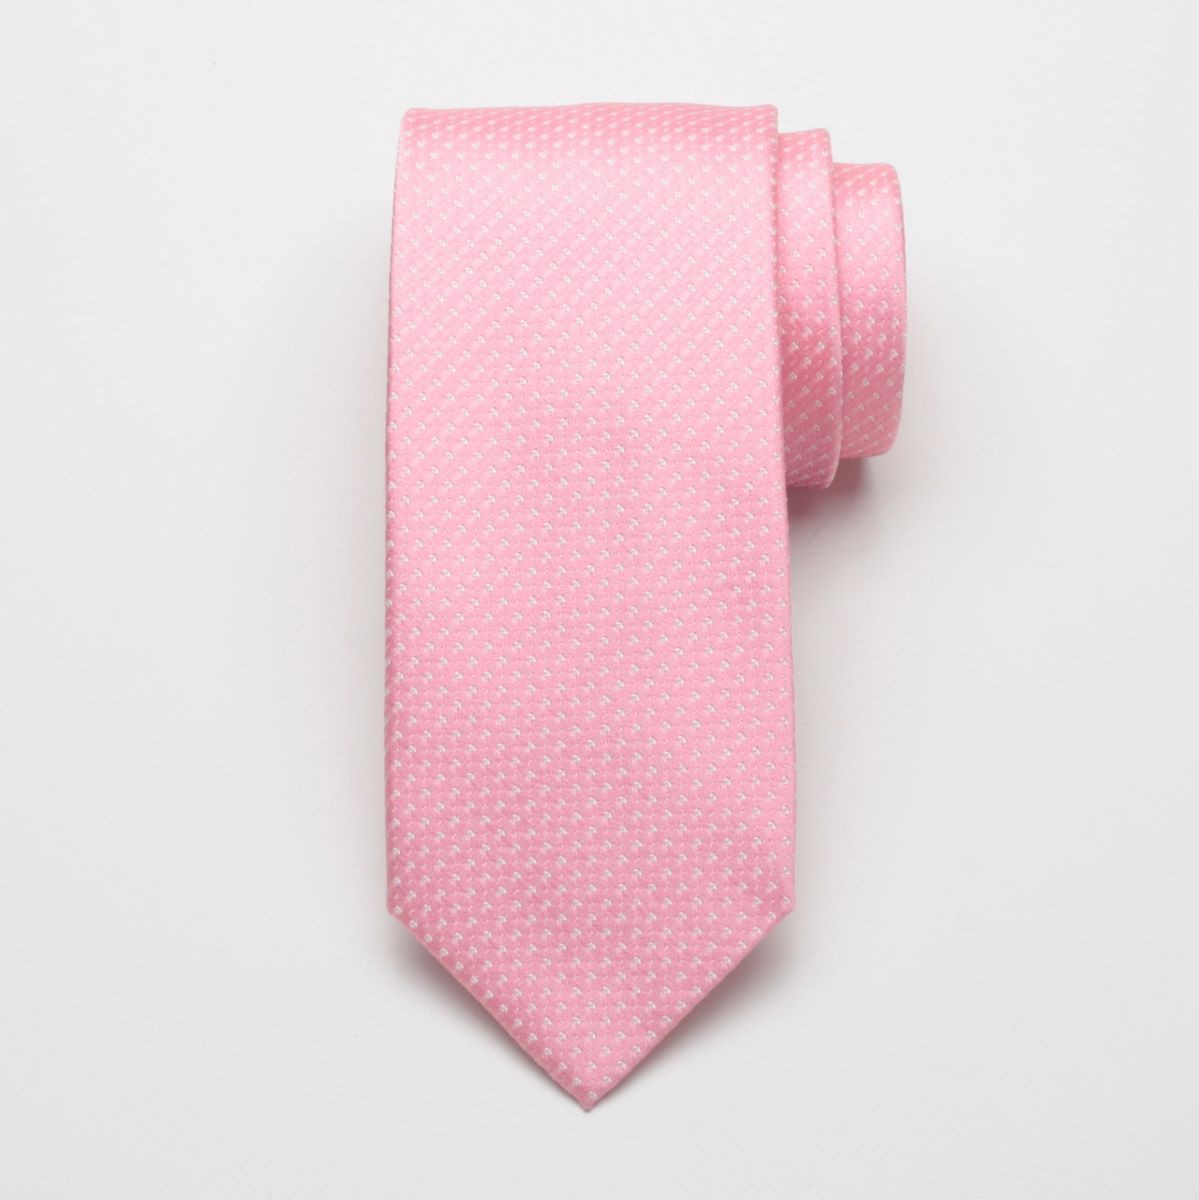 Krawat jedwabny Fine Selection (wzór 57)